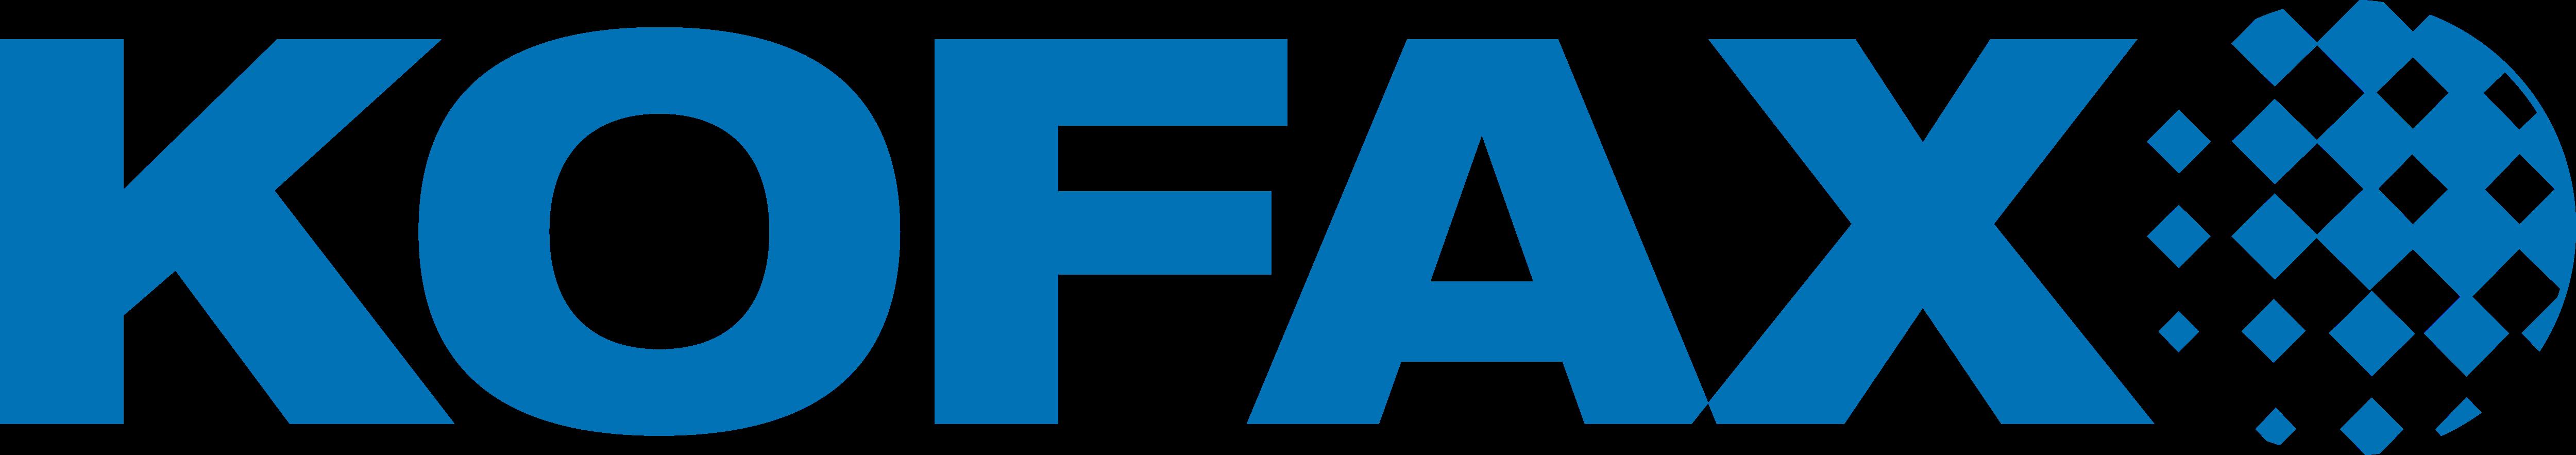 kofax-rpa